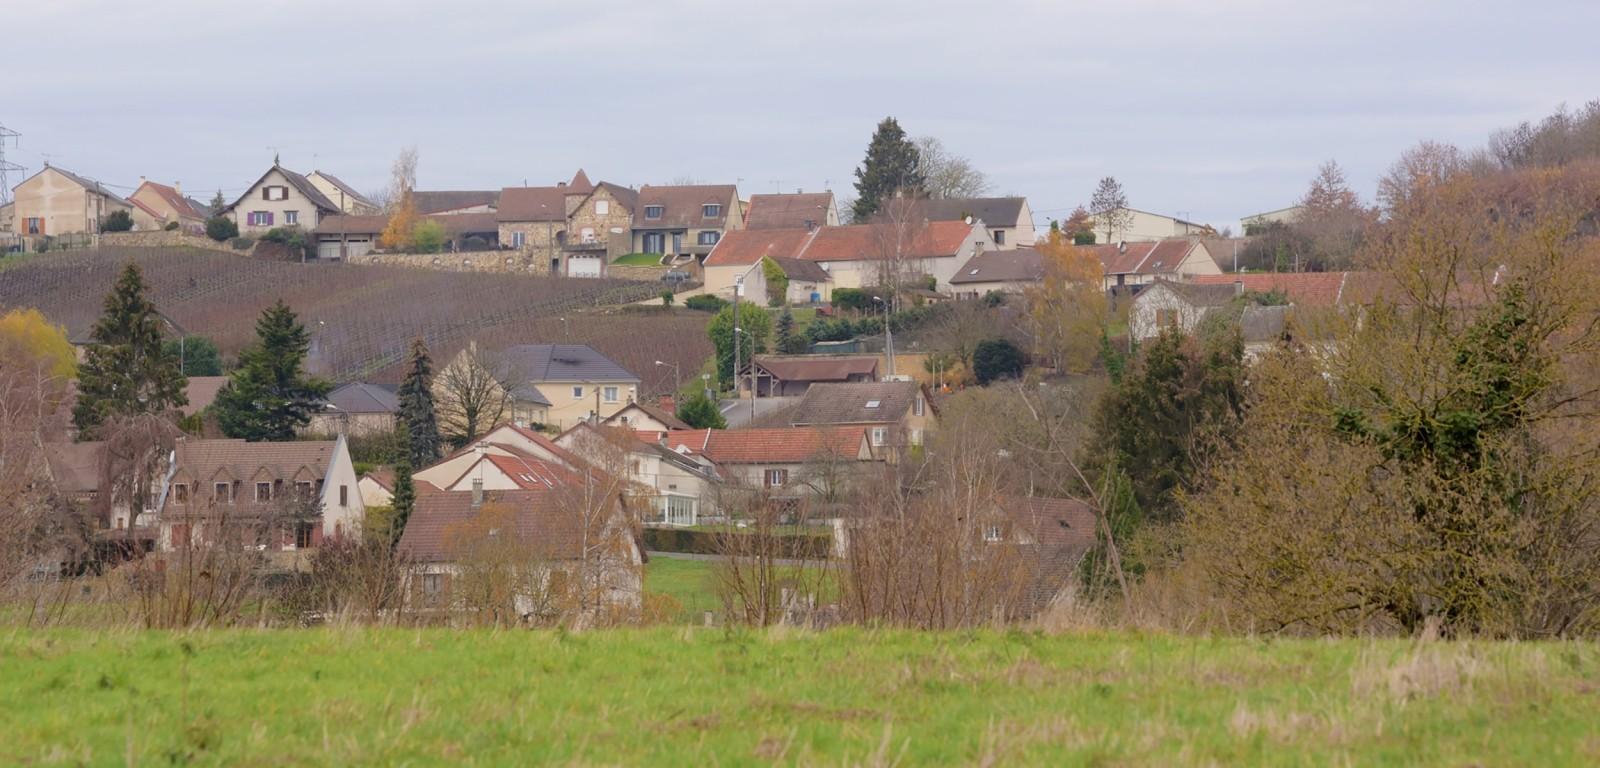 MORANGIS - photo du village